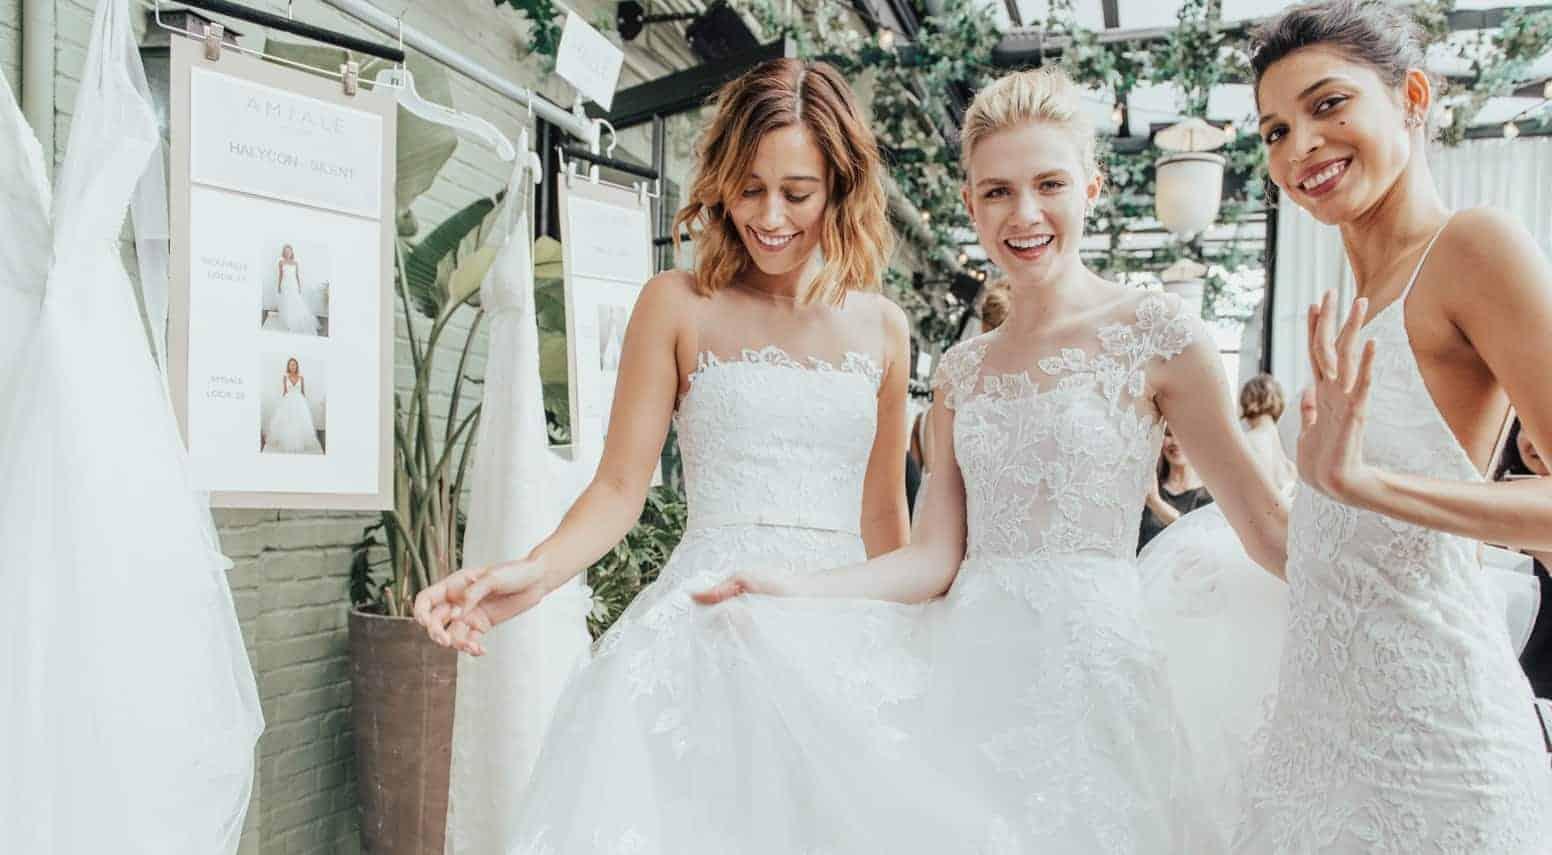 wedding dresses trends Fall 2019